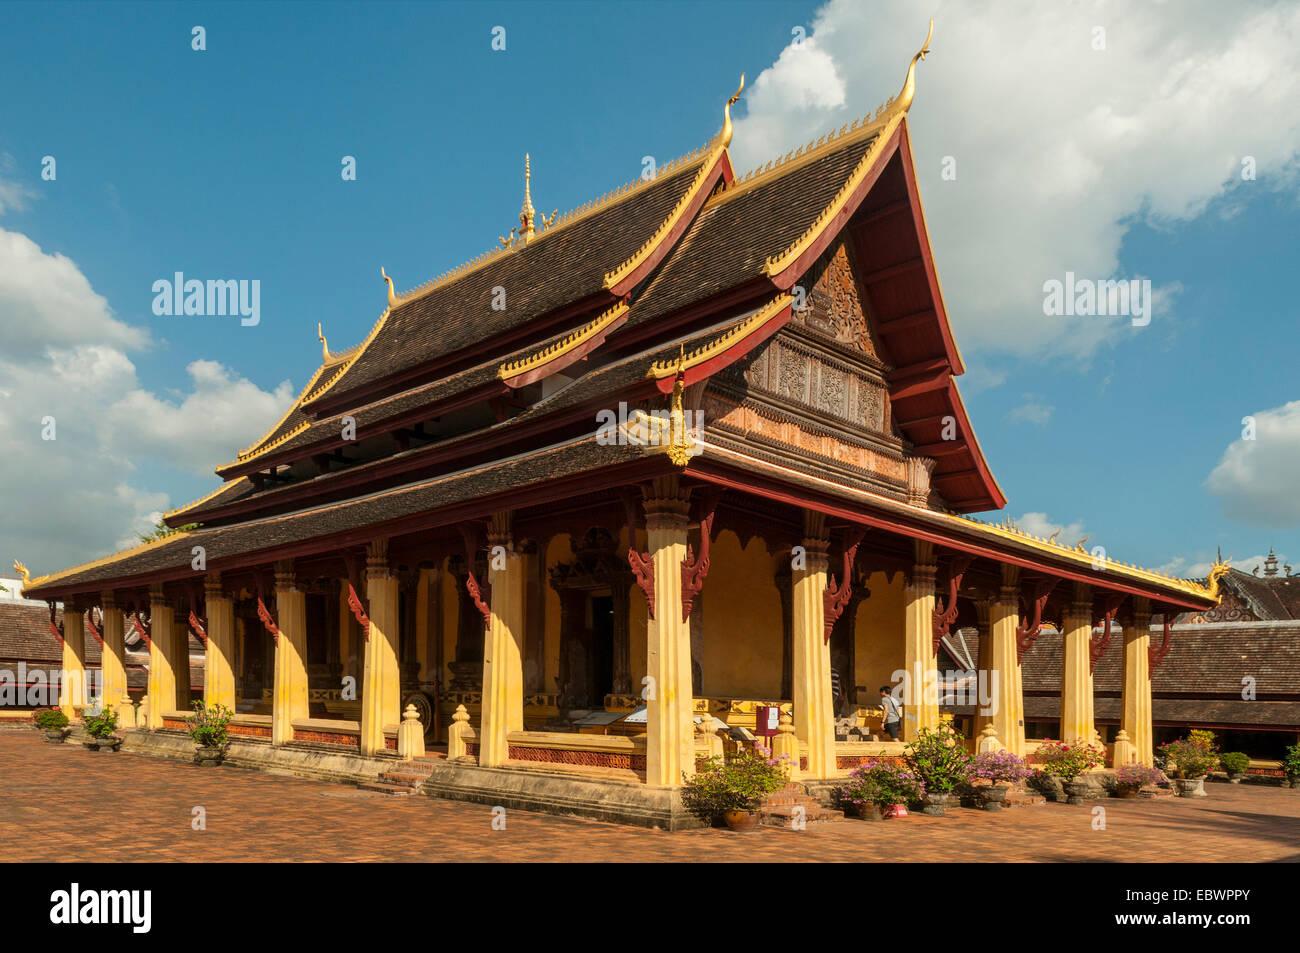 Wat Sisaket Museum, Vientiane, Laos Stock Photo, Royalty ...